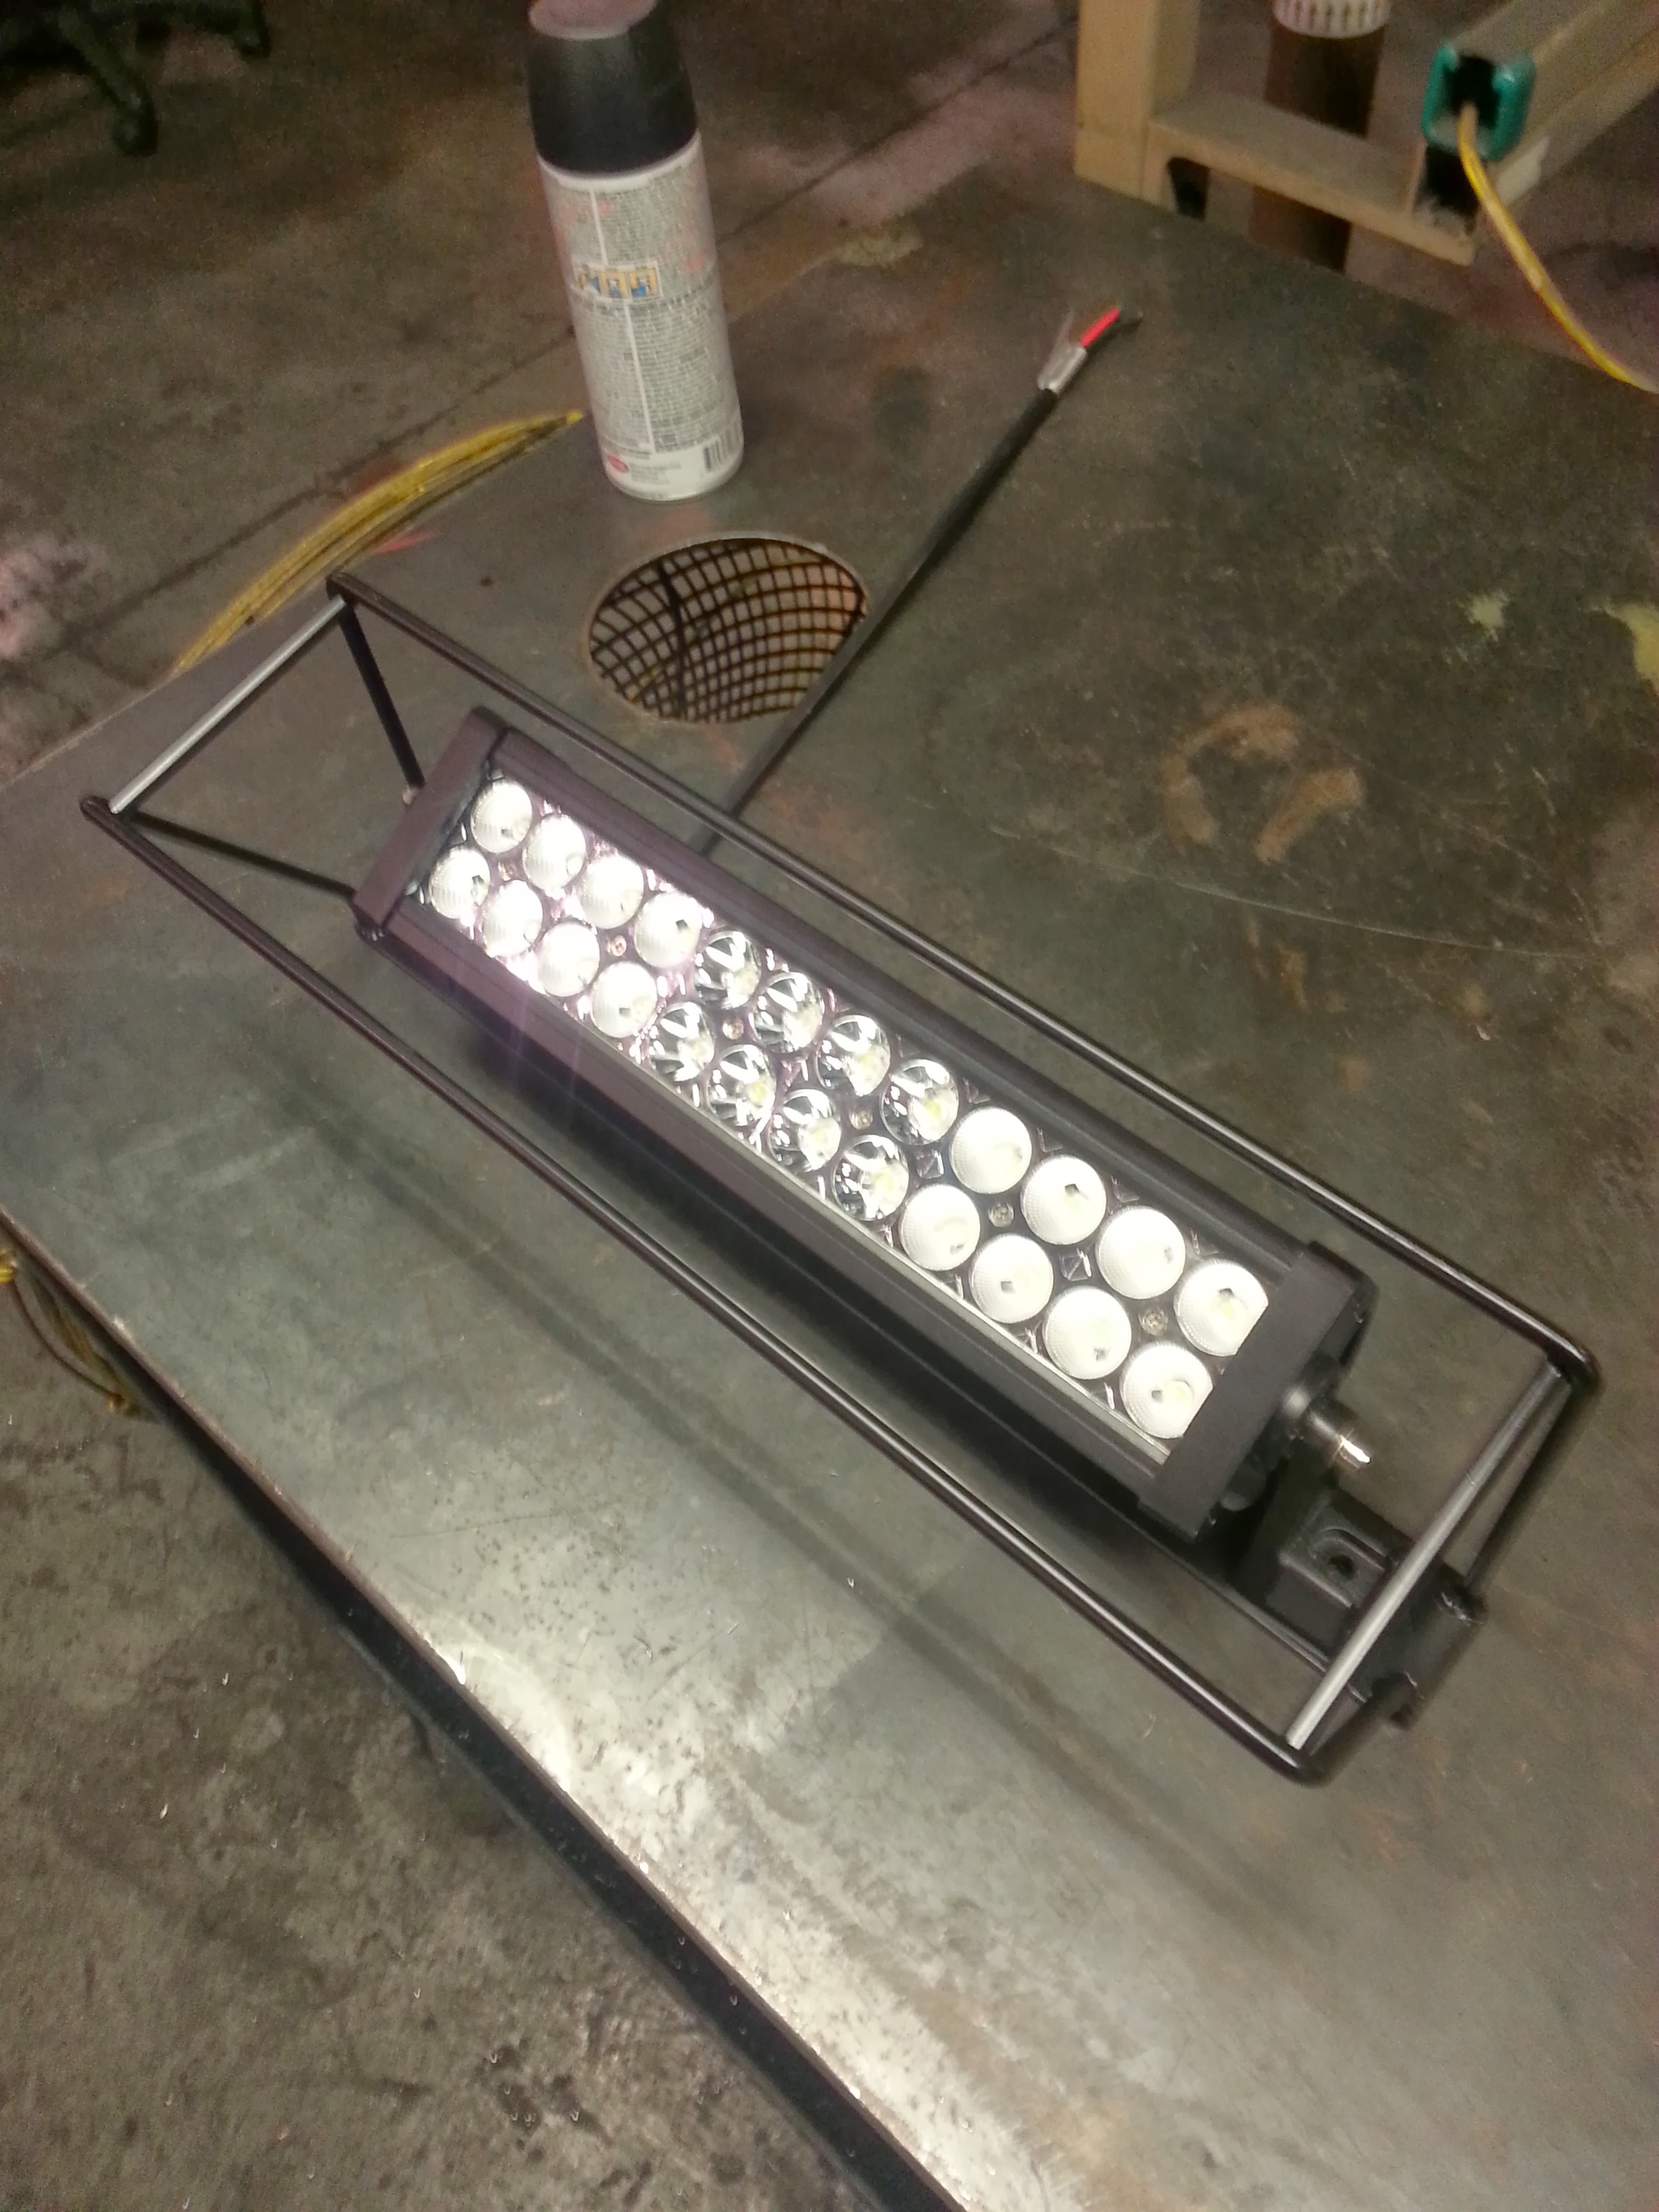 Small led light bar mounted name light bar cageg views 2530 size 10172 aloadofball Image collections